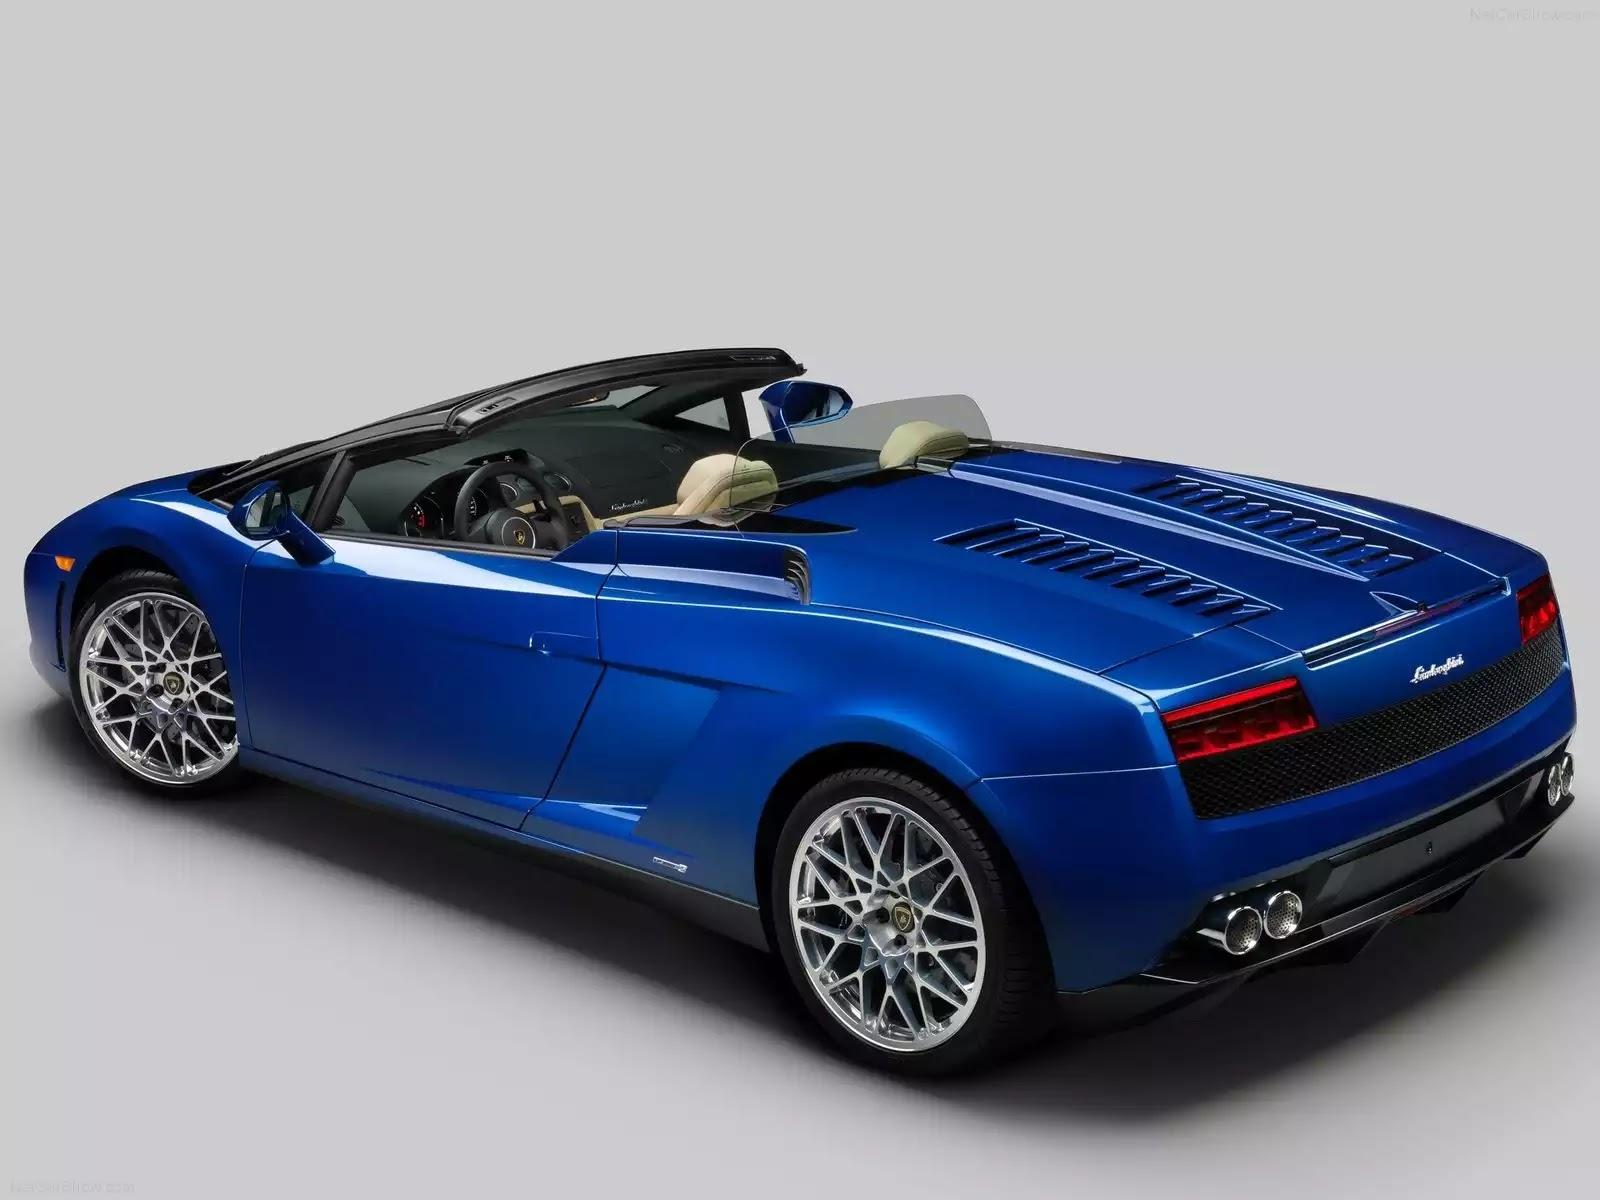 Hình ảnh siêu xe Lamborghini Gallardo LP550-2 Spyder 2012 & nội ngoại thất